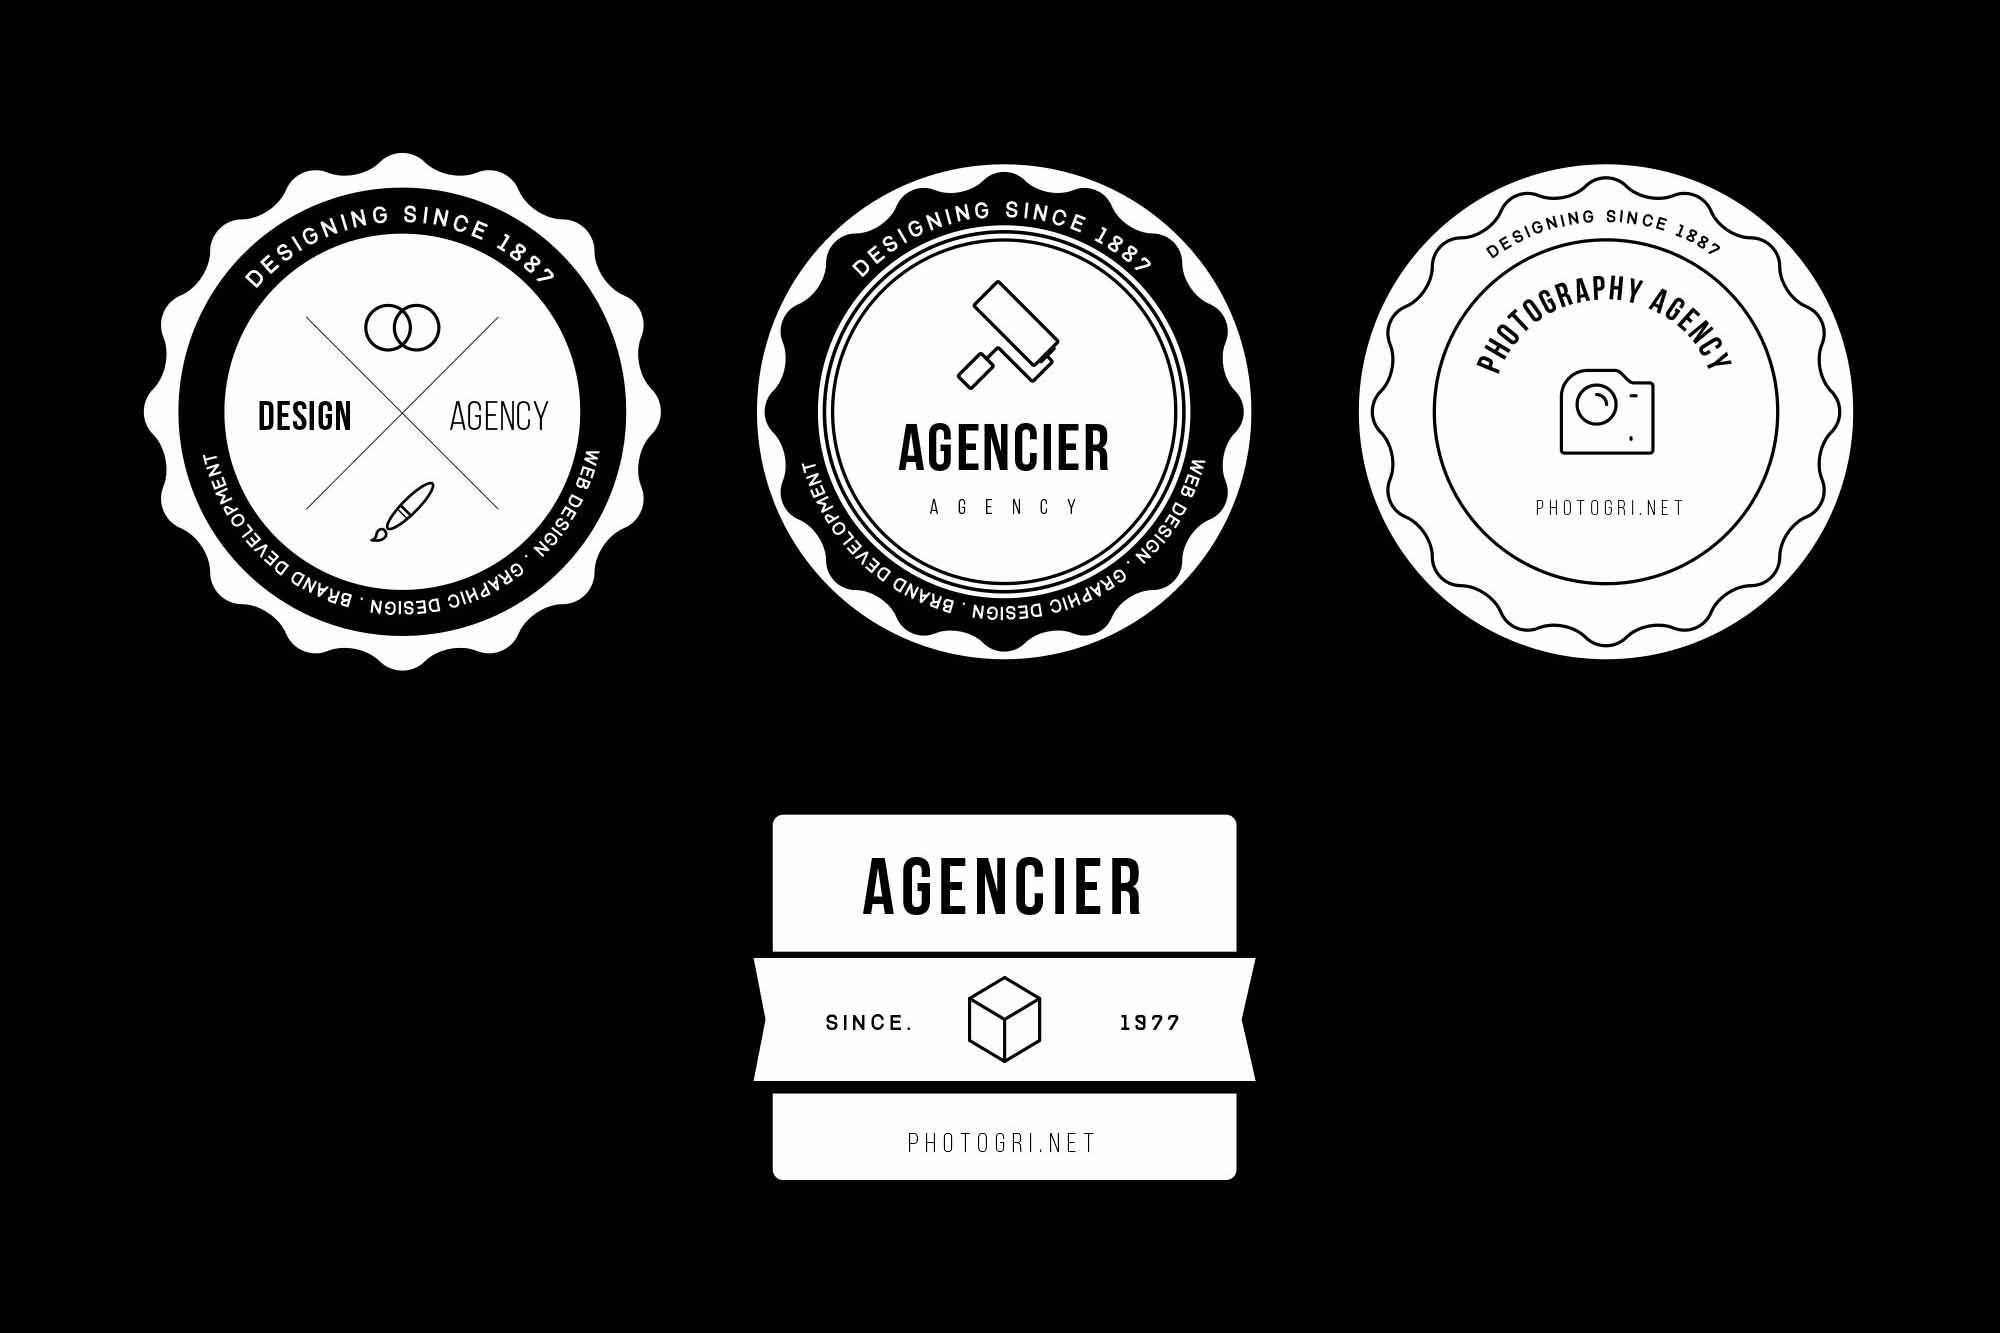 Agency Vector Badges 2